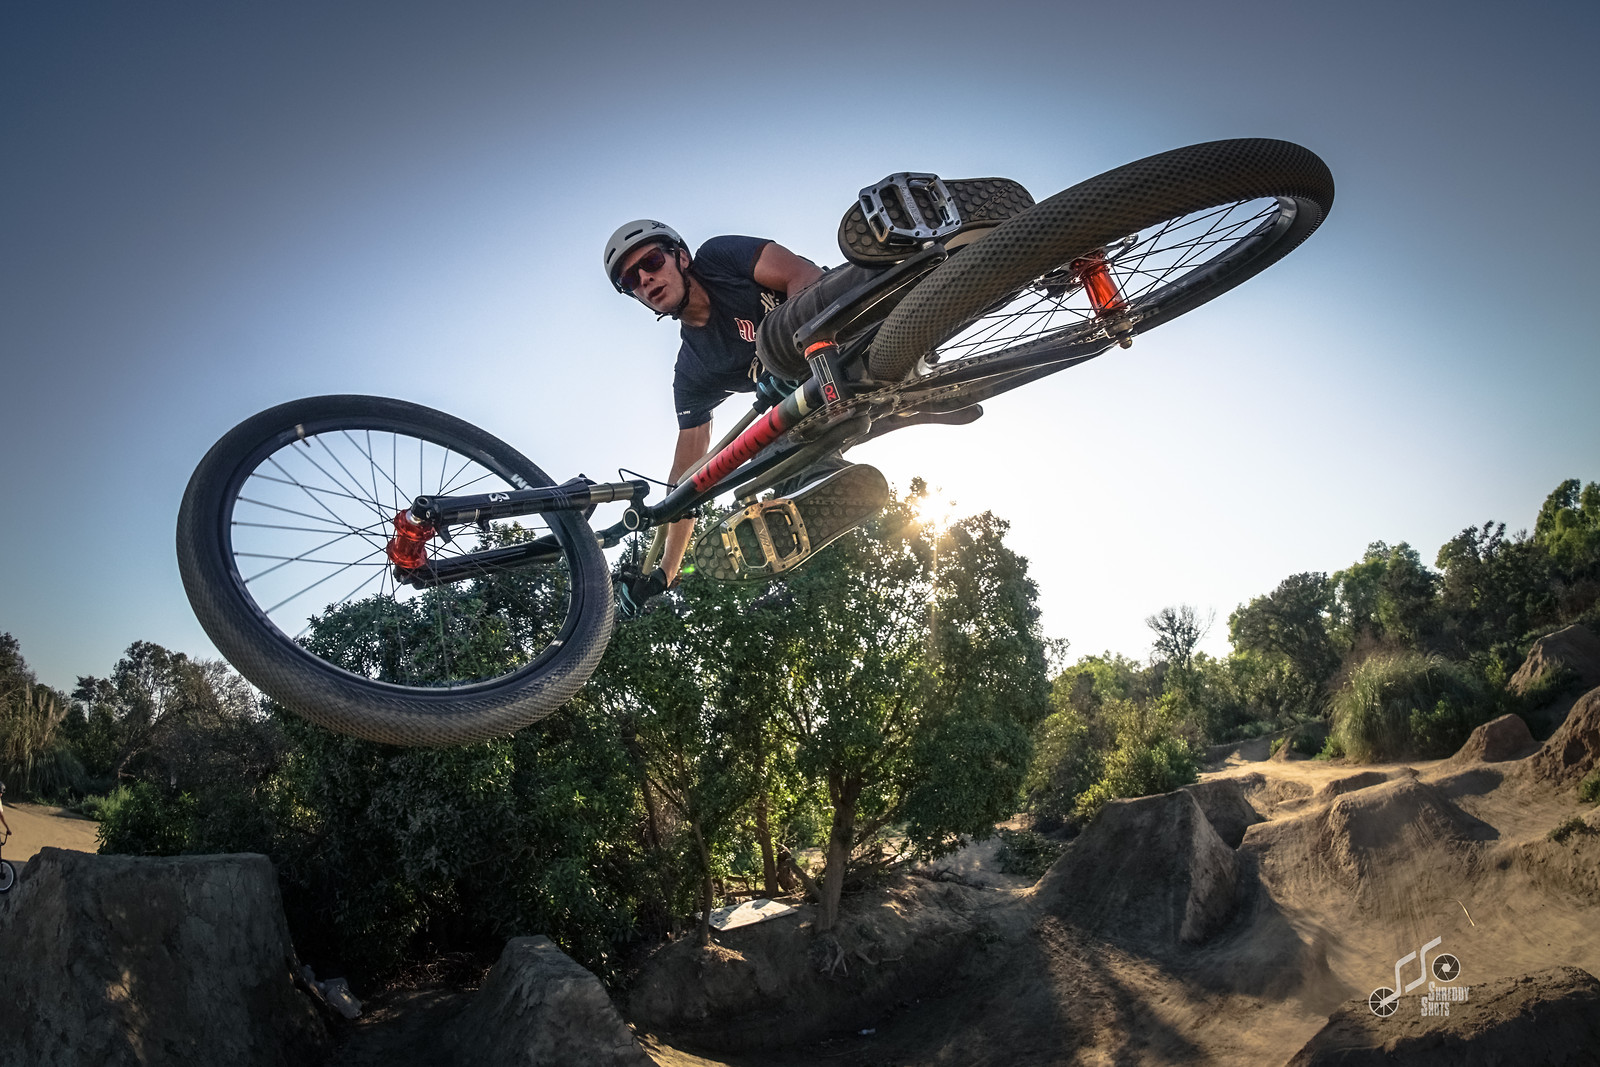 Brian Super tight - shreddyshots - Mountain Biking Pictures - Vital MTB